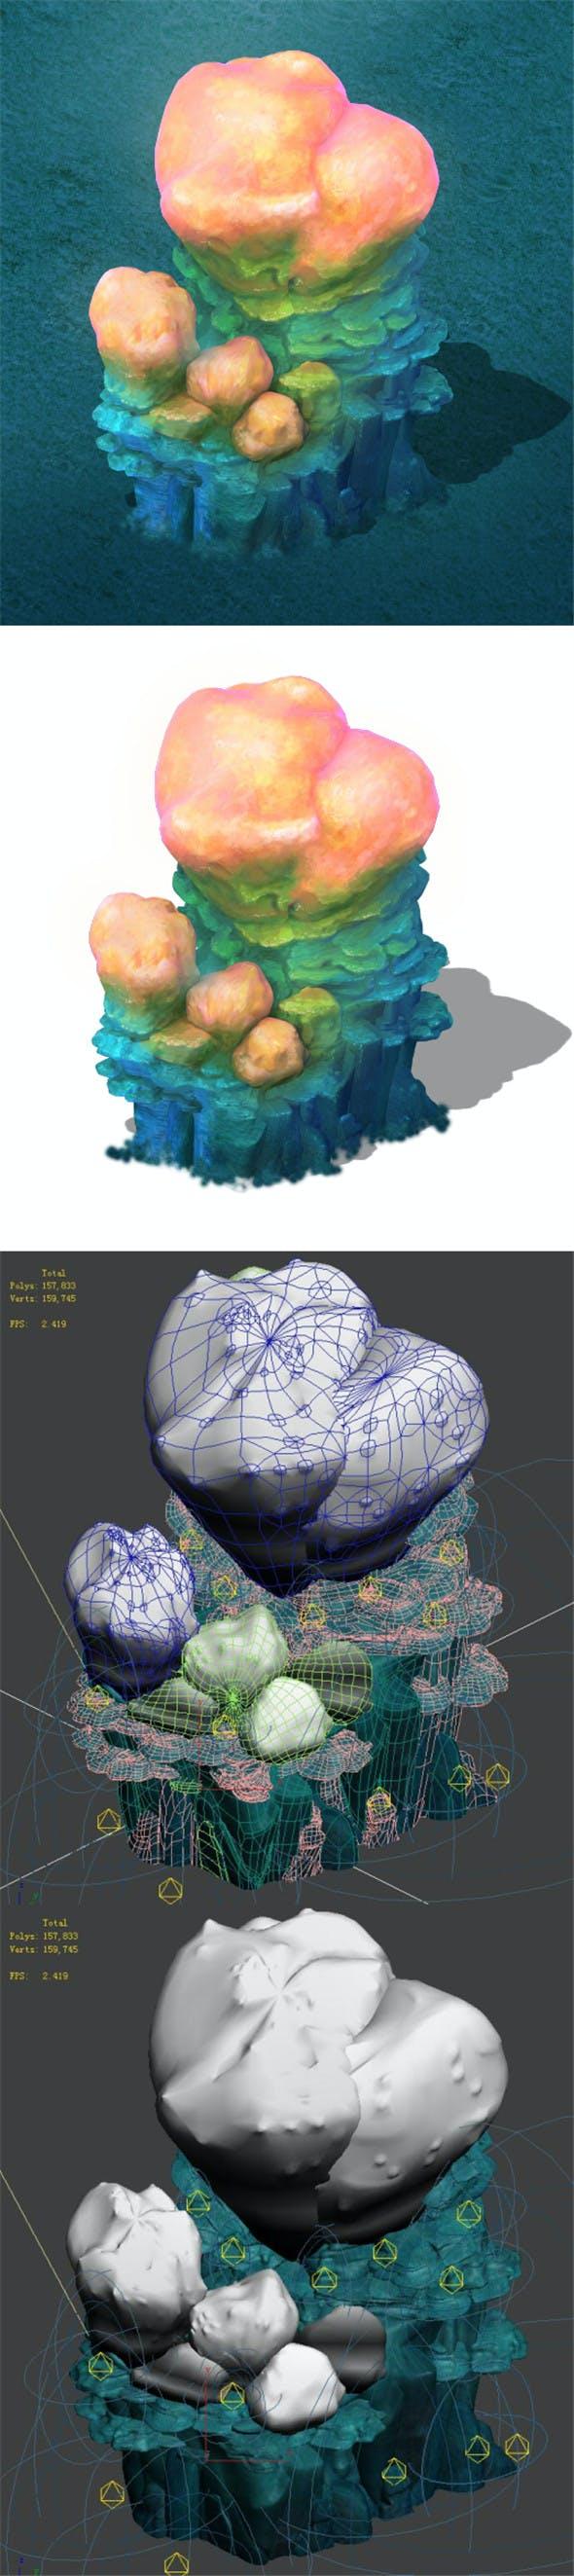 Submarine Cartoon World - Sarcoma Coral 01 - 3DOcean Item for Sale